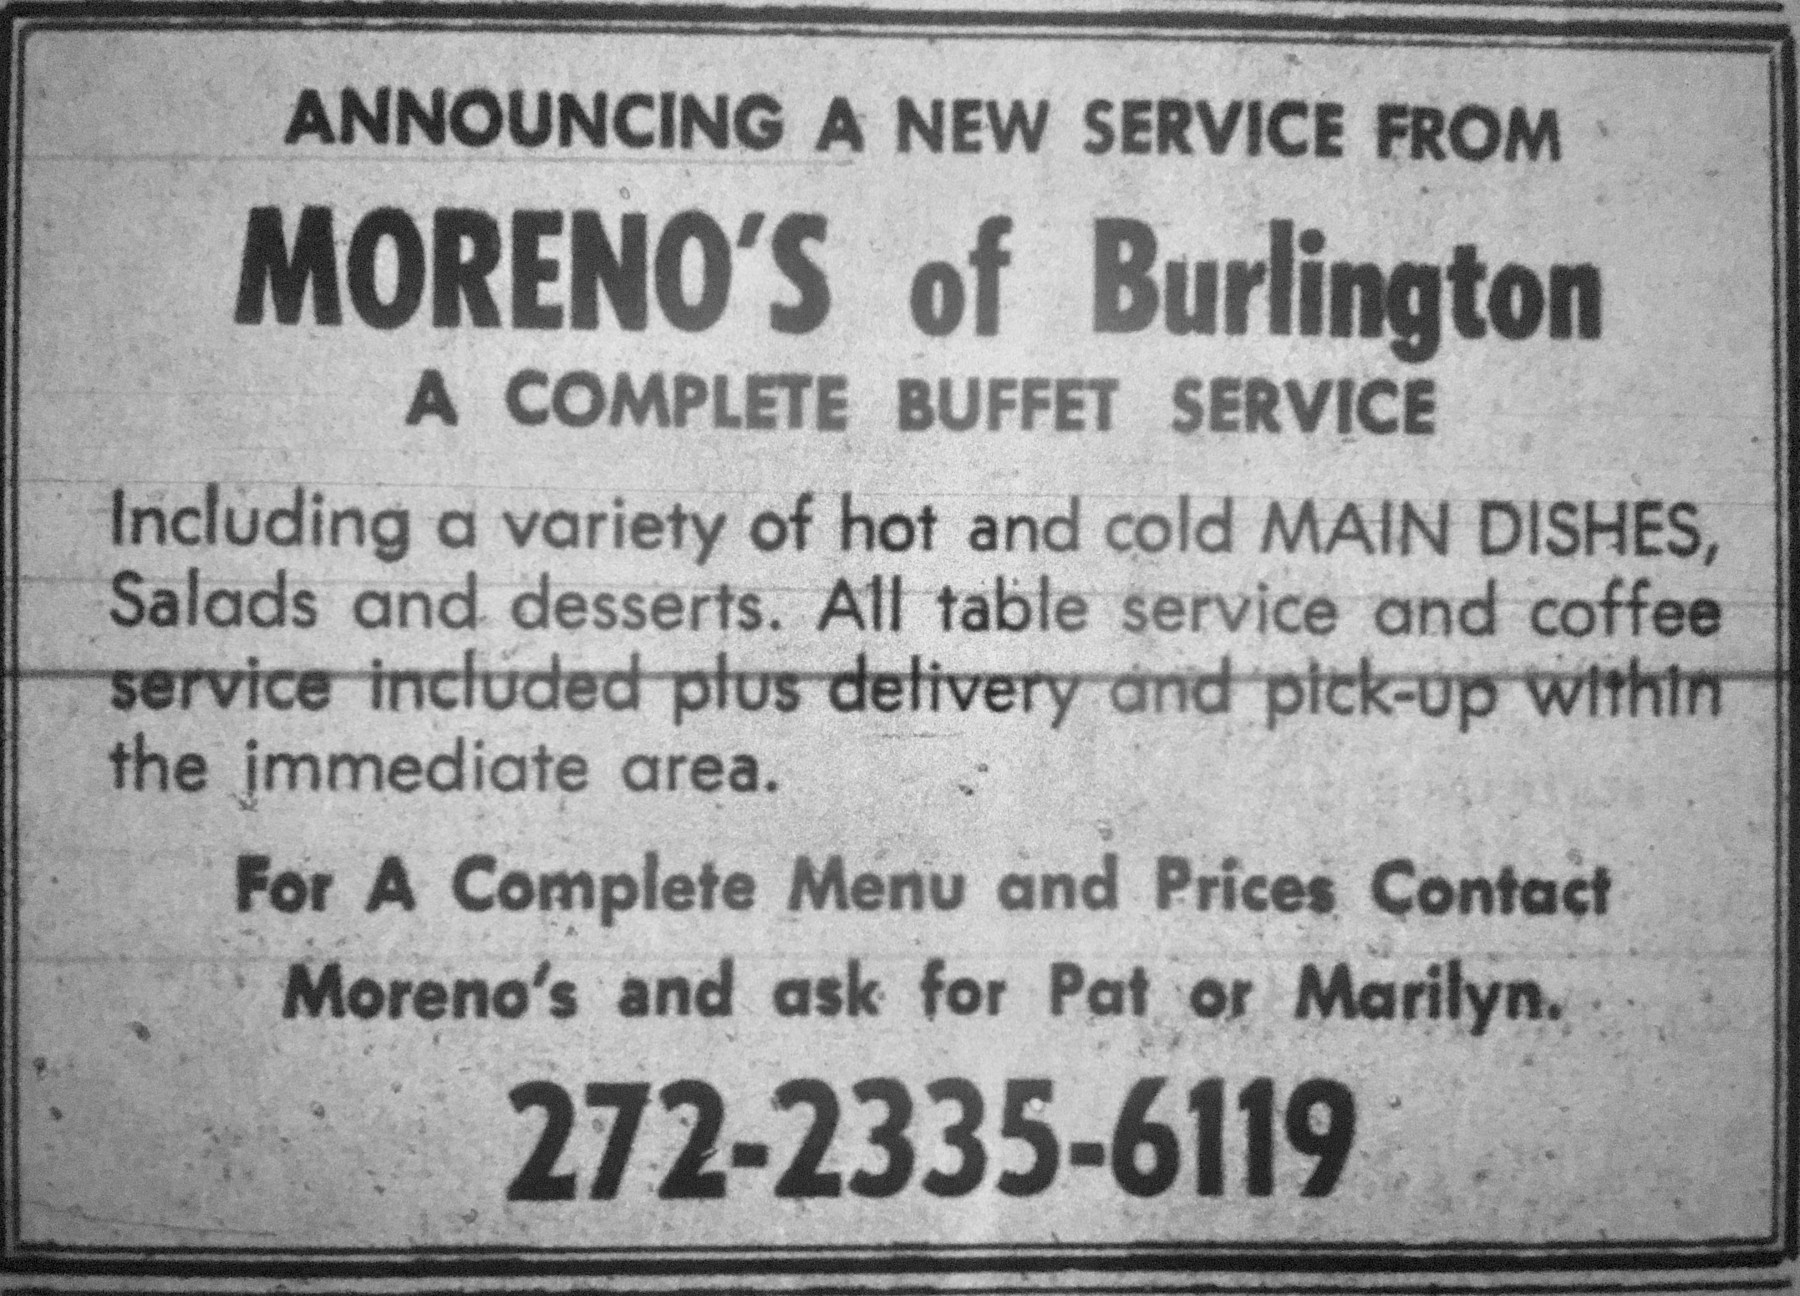 Moreno's of Burlington, MA